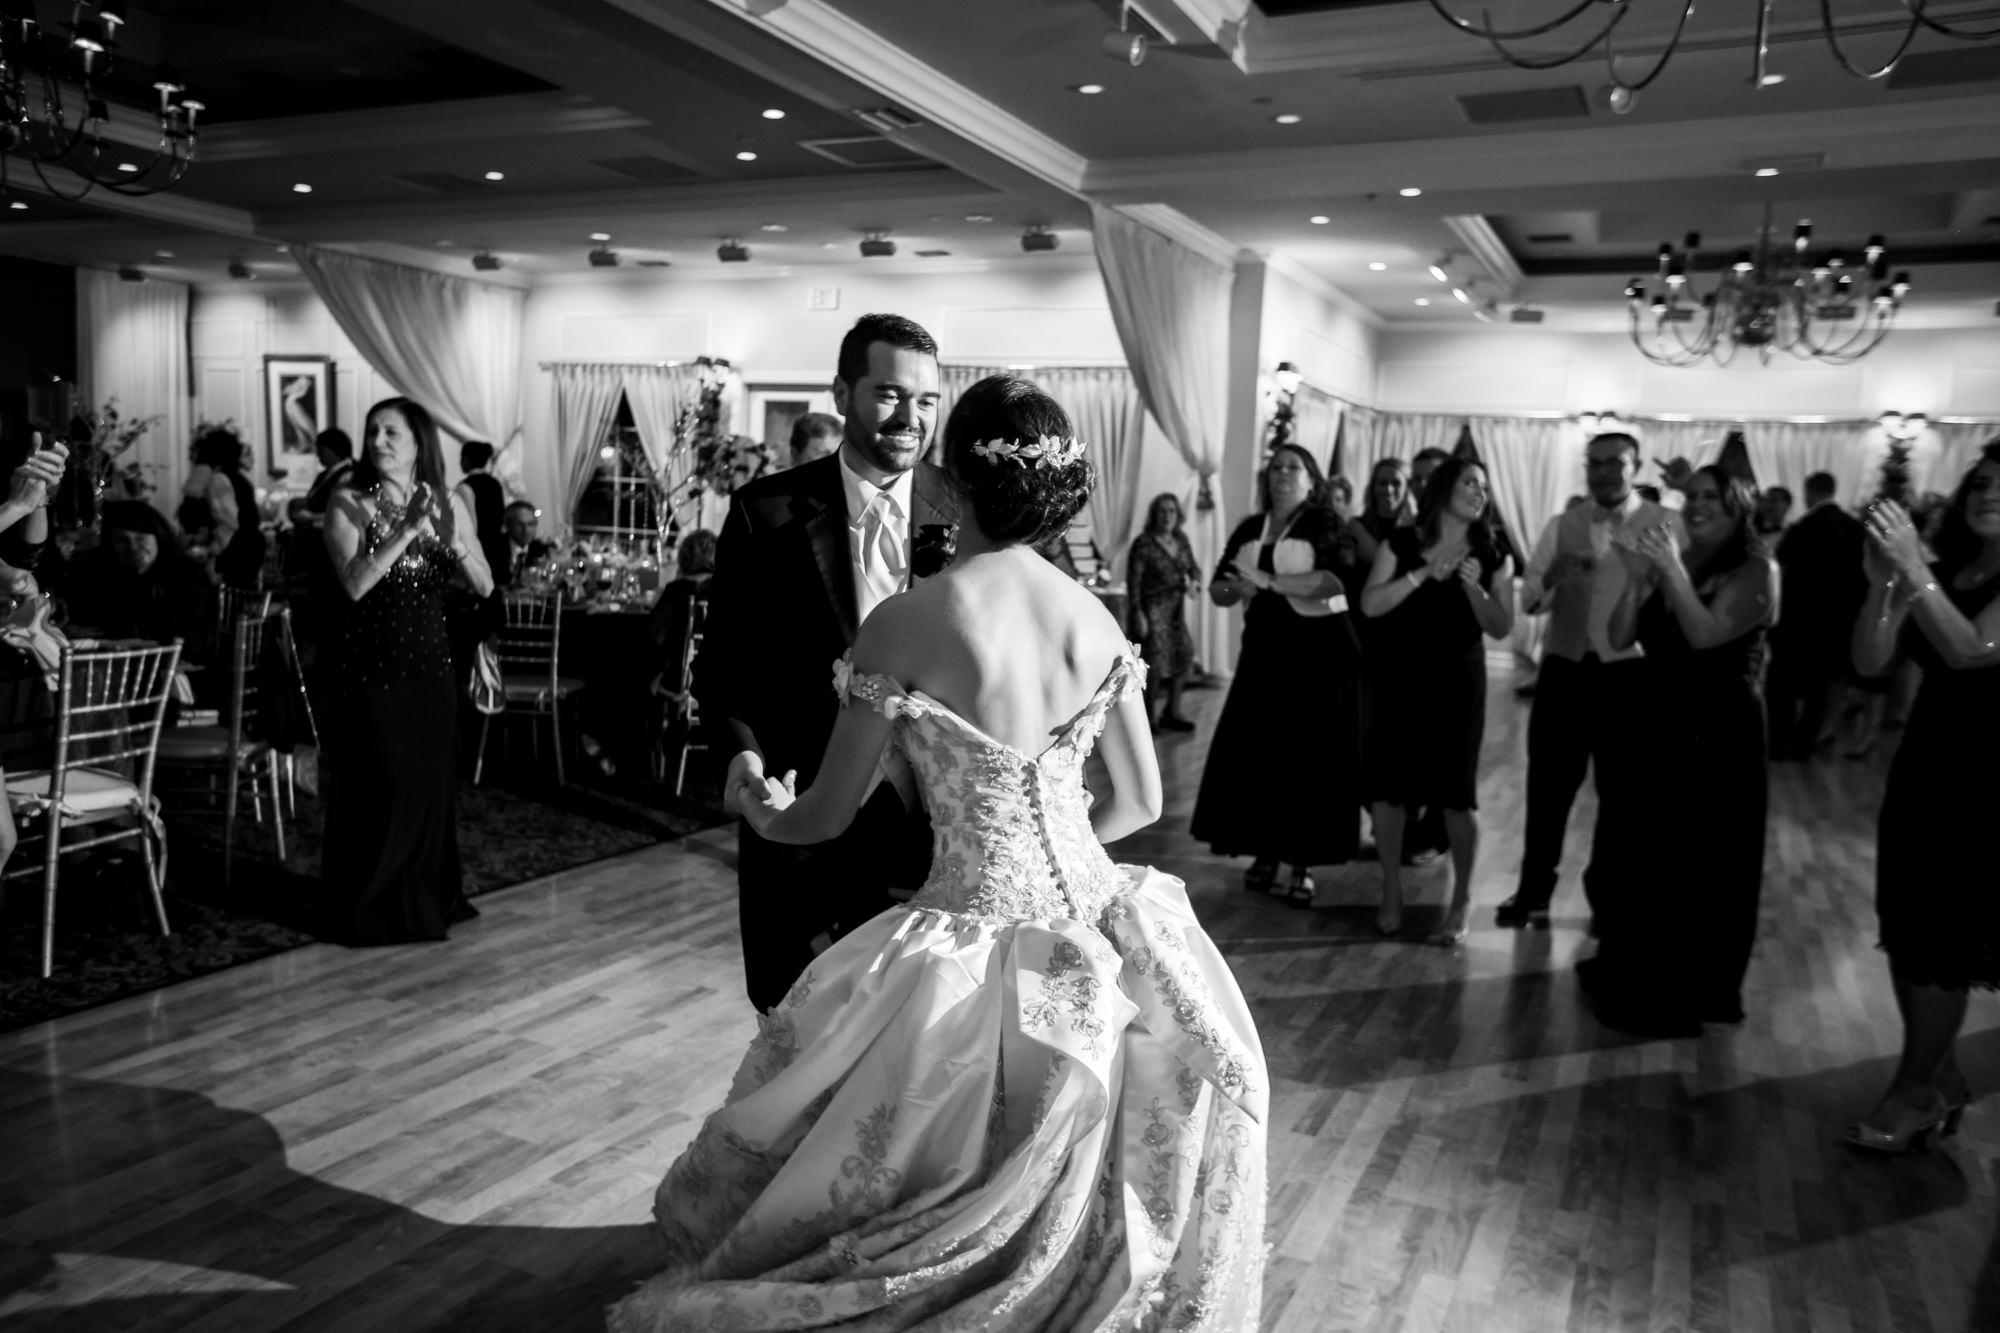 Benvenuto_Wedding_catholic_Florida_Bride-Groom-131.jpg